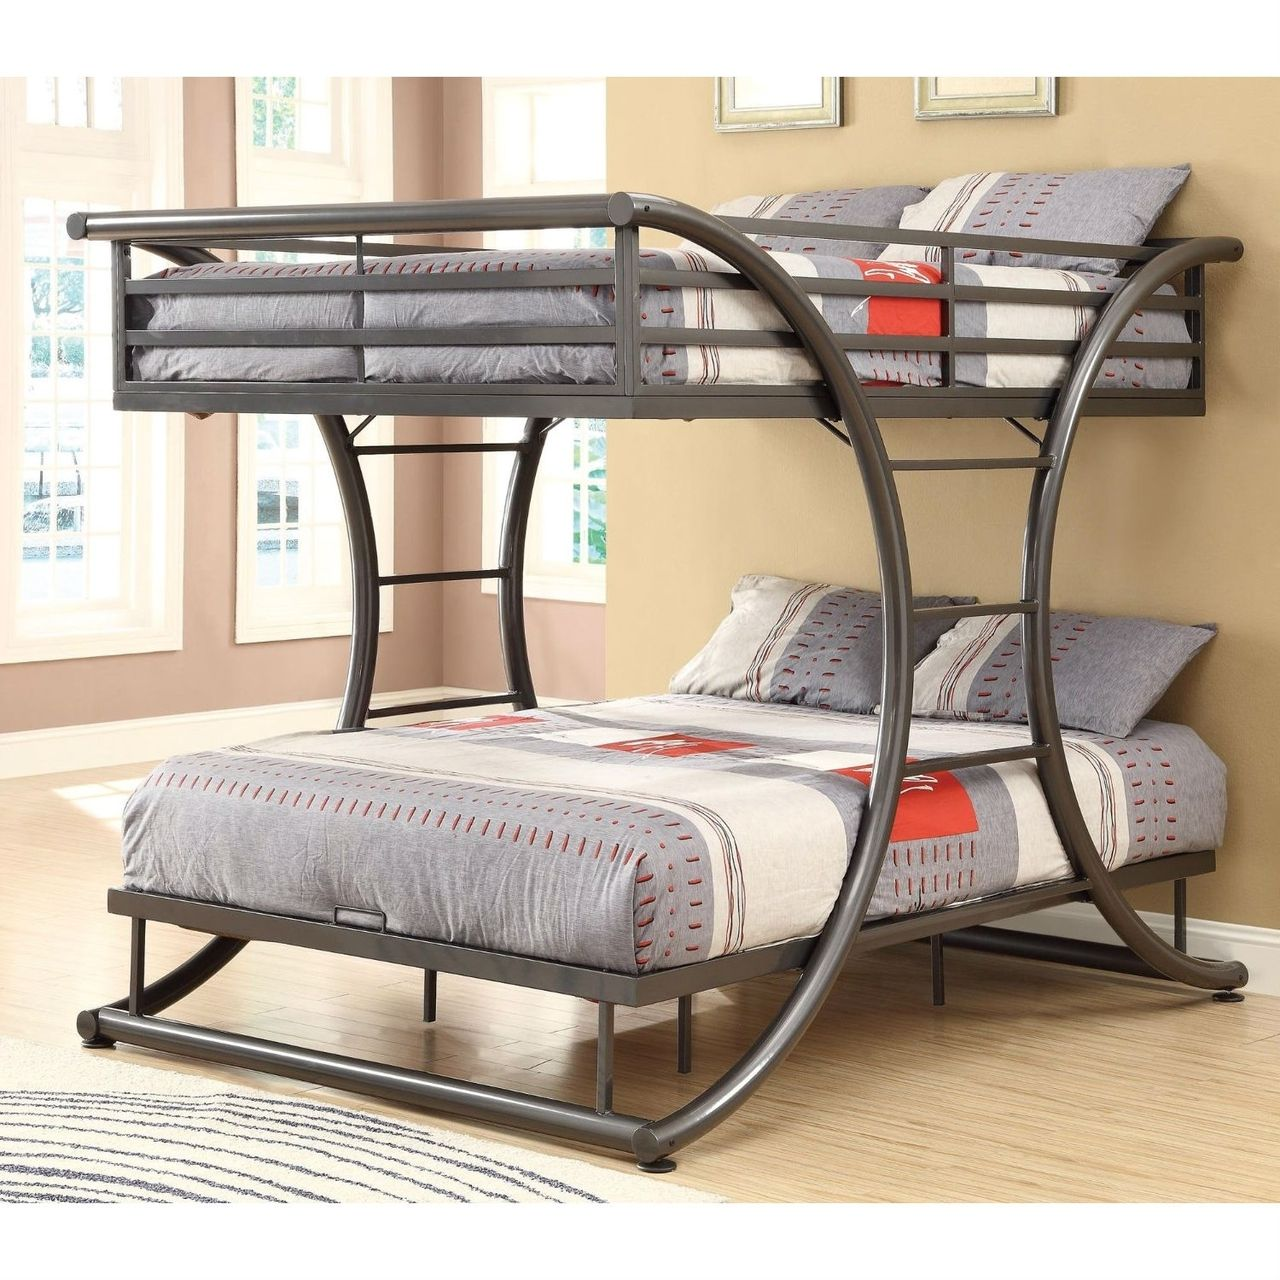 Full Over Full Modern Metal Bunk Bed Frame In Gunmetal Finish Cool Bunk Beds Loft Bed Frame Metal Bunk Beds Full size bed bunk beds